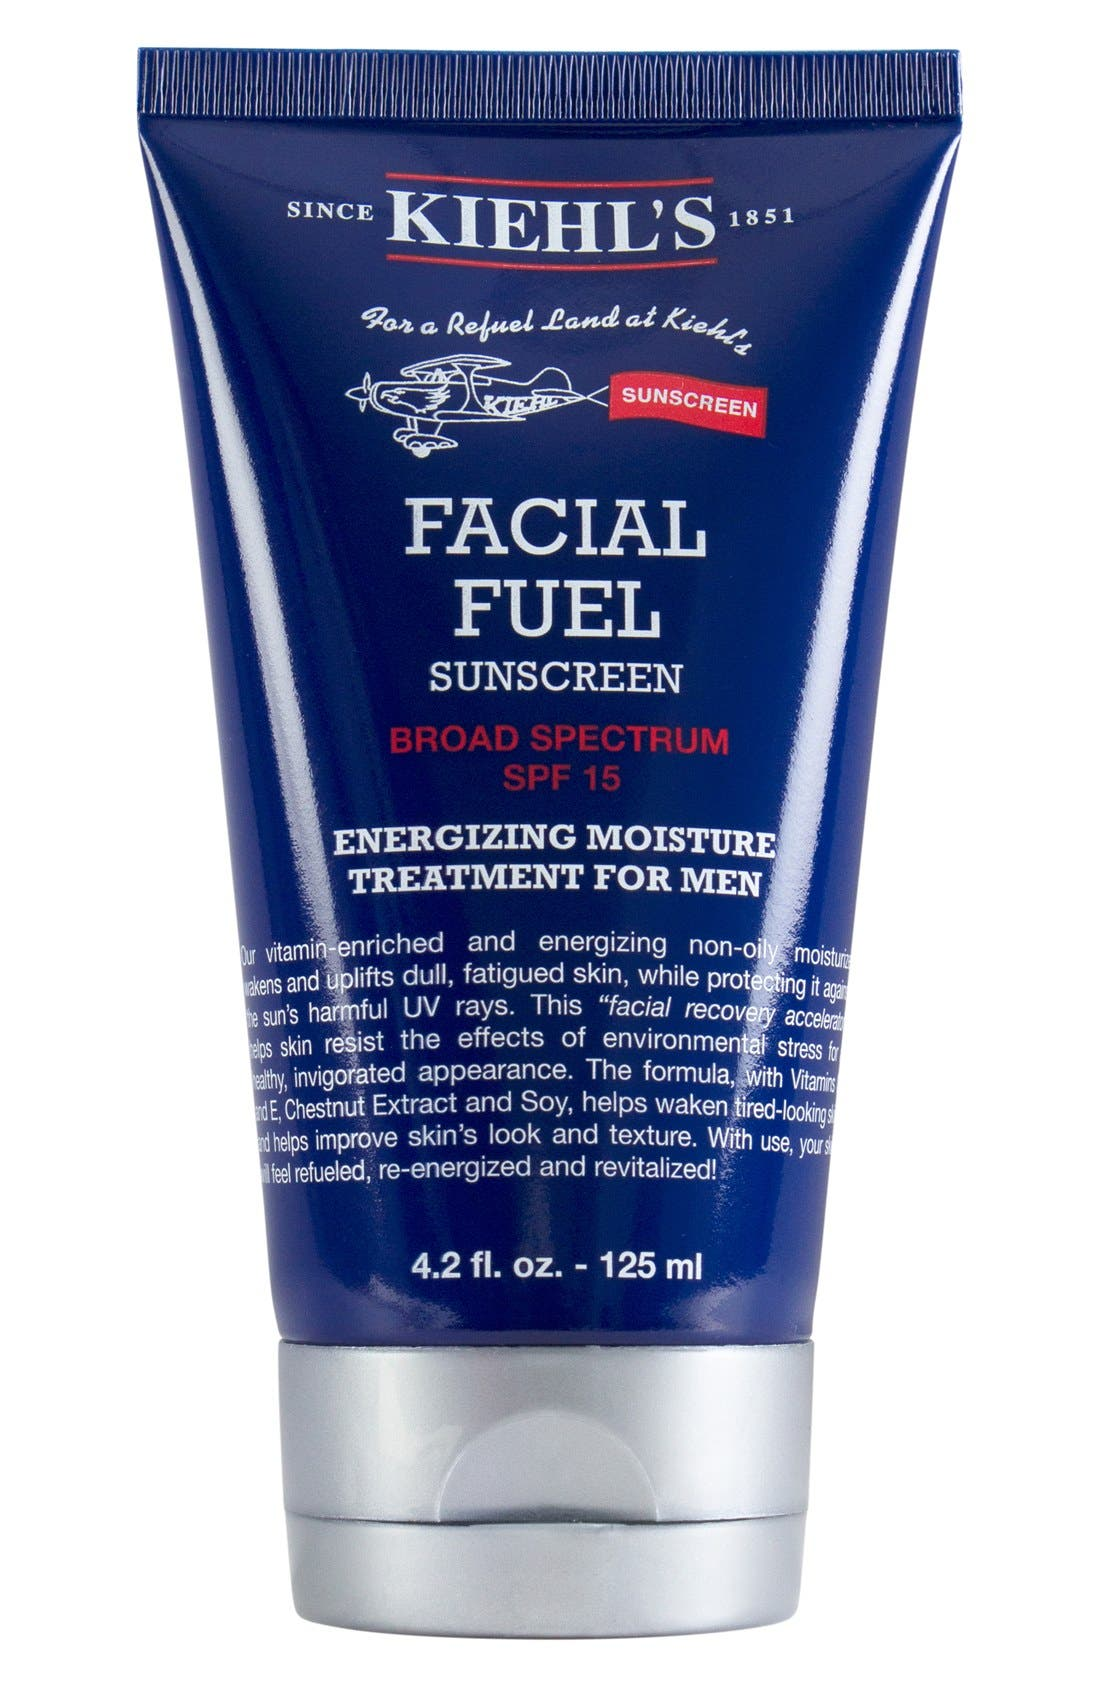 'Facial Fuel' EnergizingMoisture Treatment for Men SPF 15,                             Main thumbnail 1, color,                             000